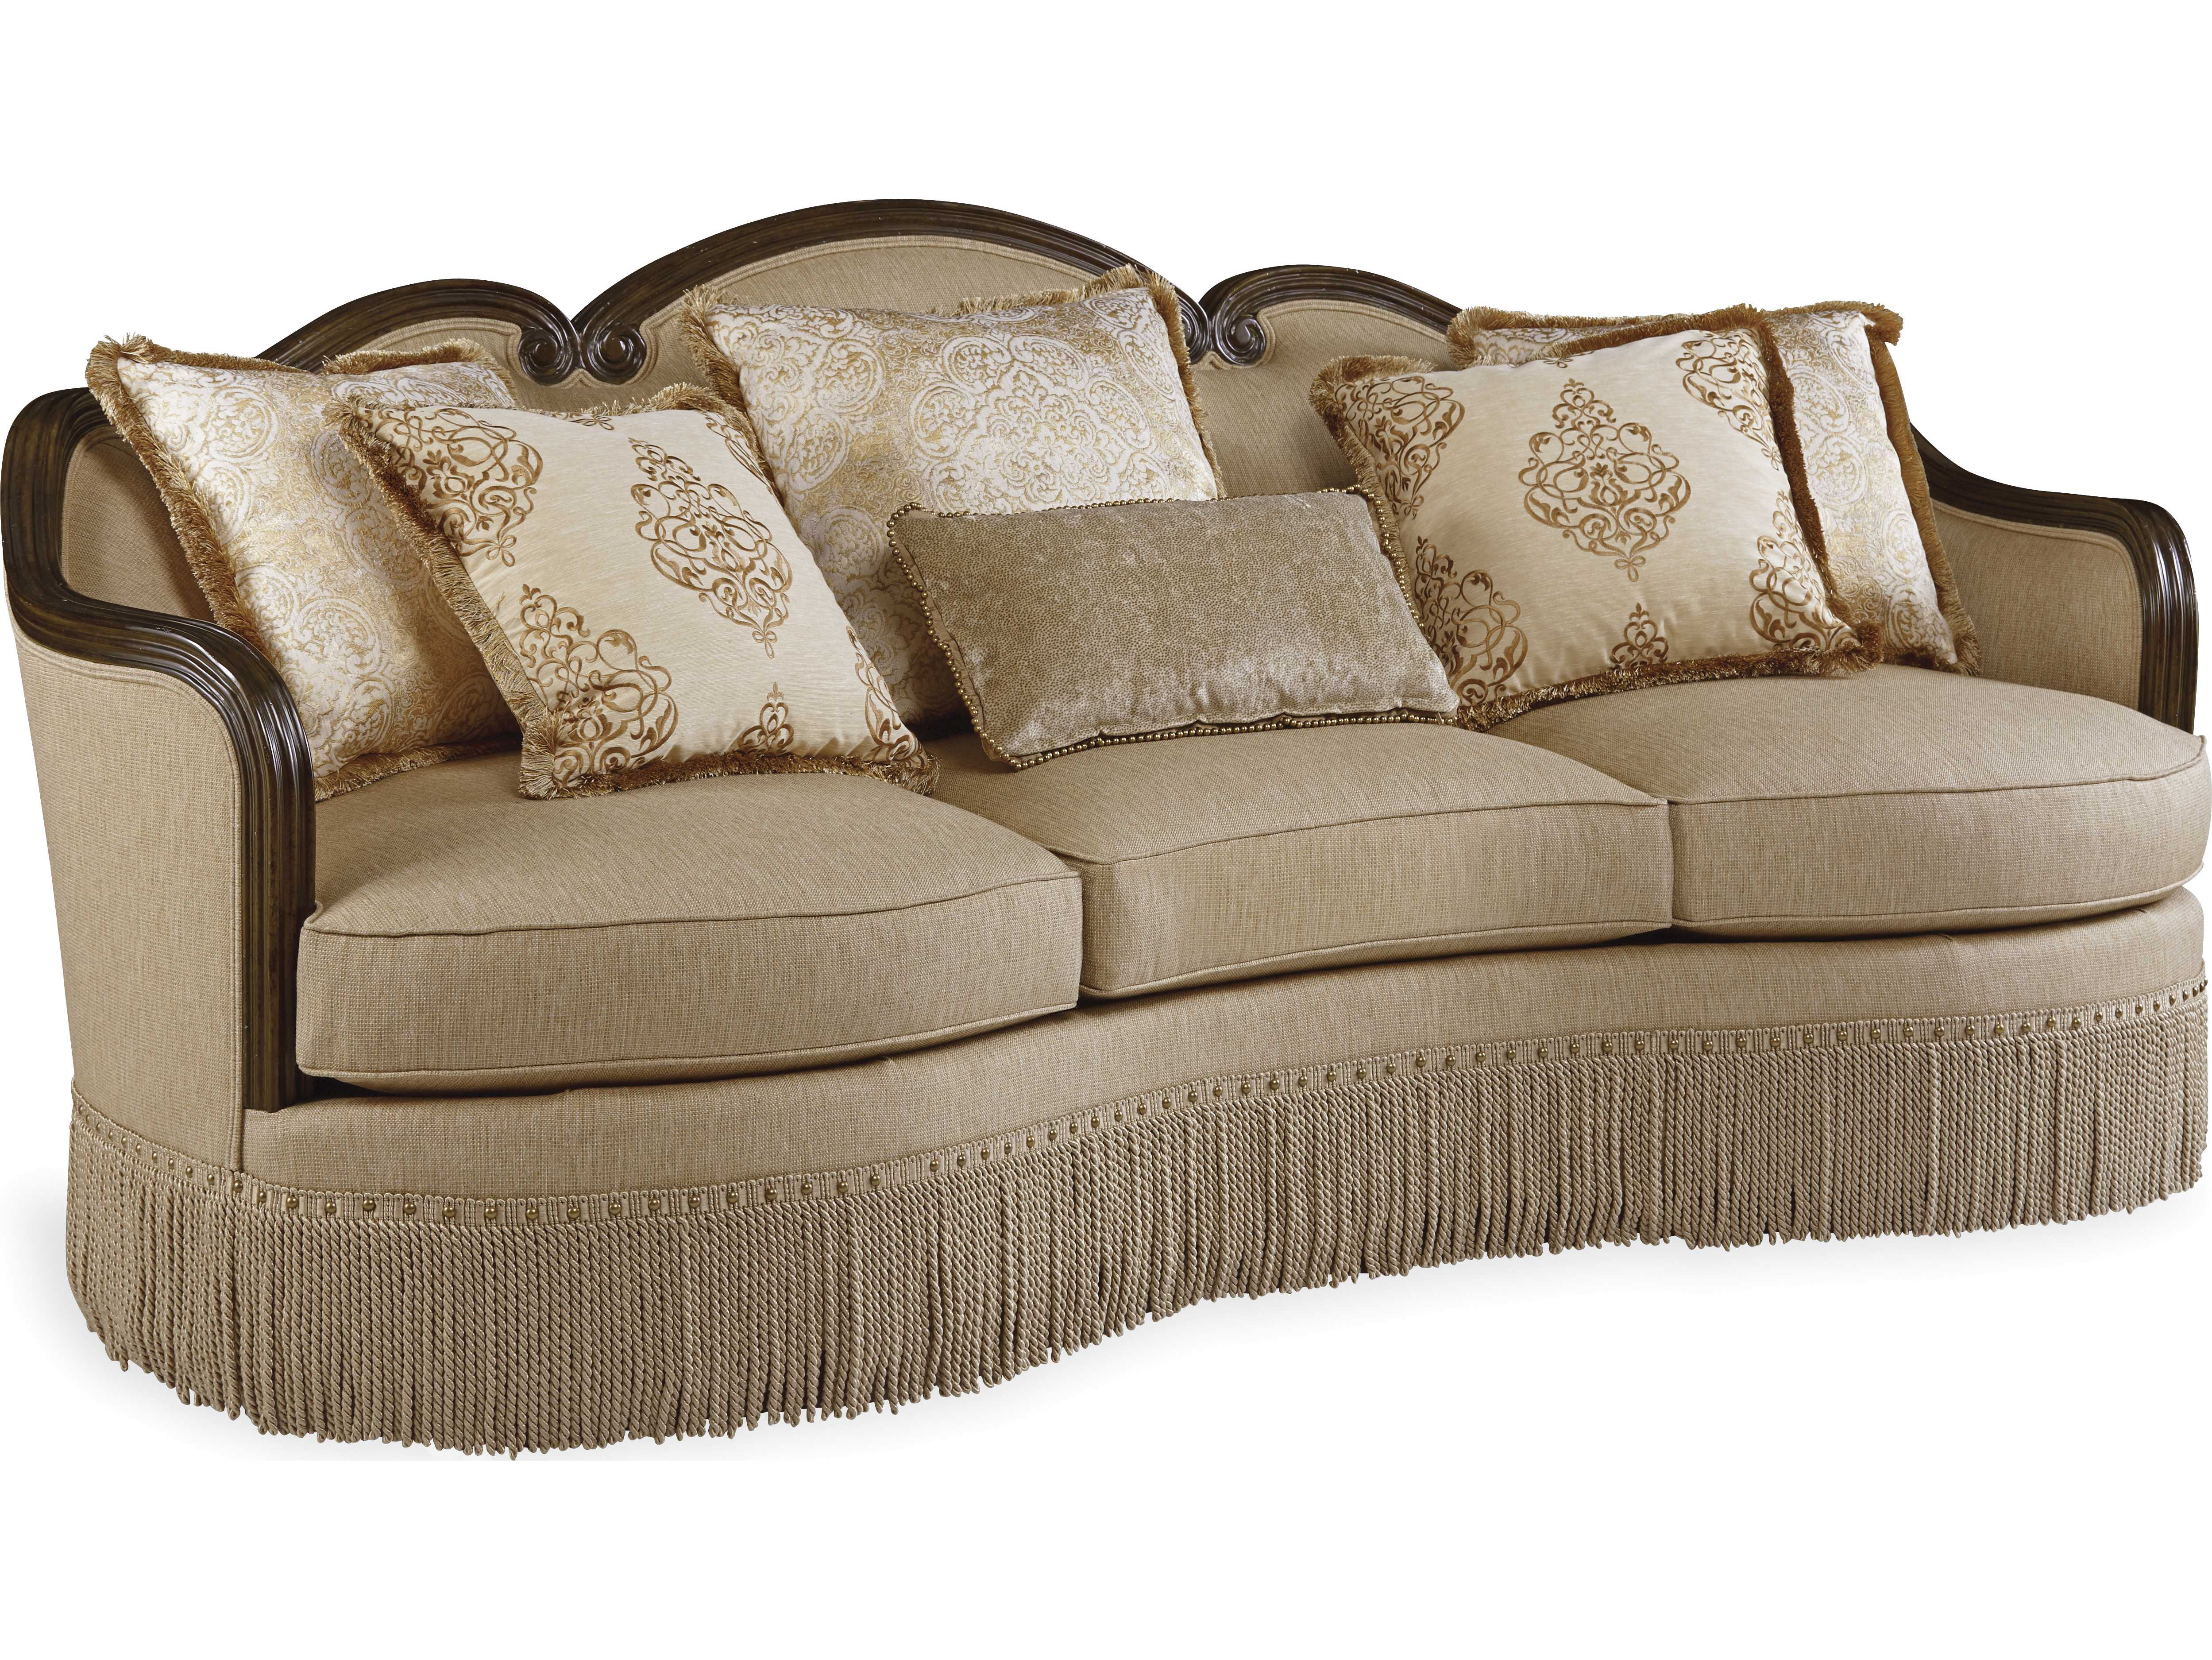 Art furniture giovanna golden quartz valencia sofa - Sofas valencia alberic ...